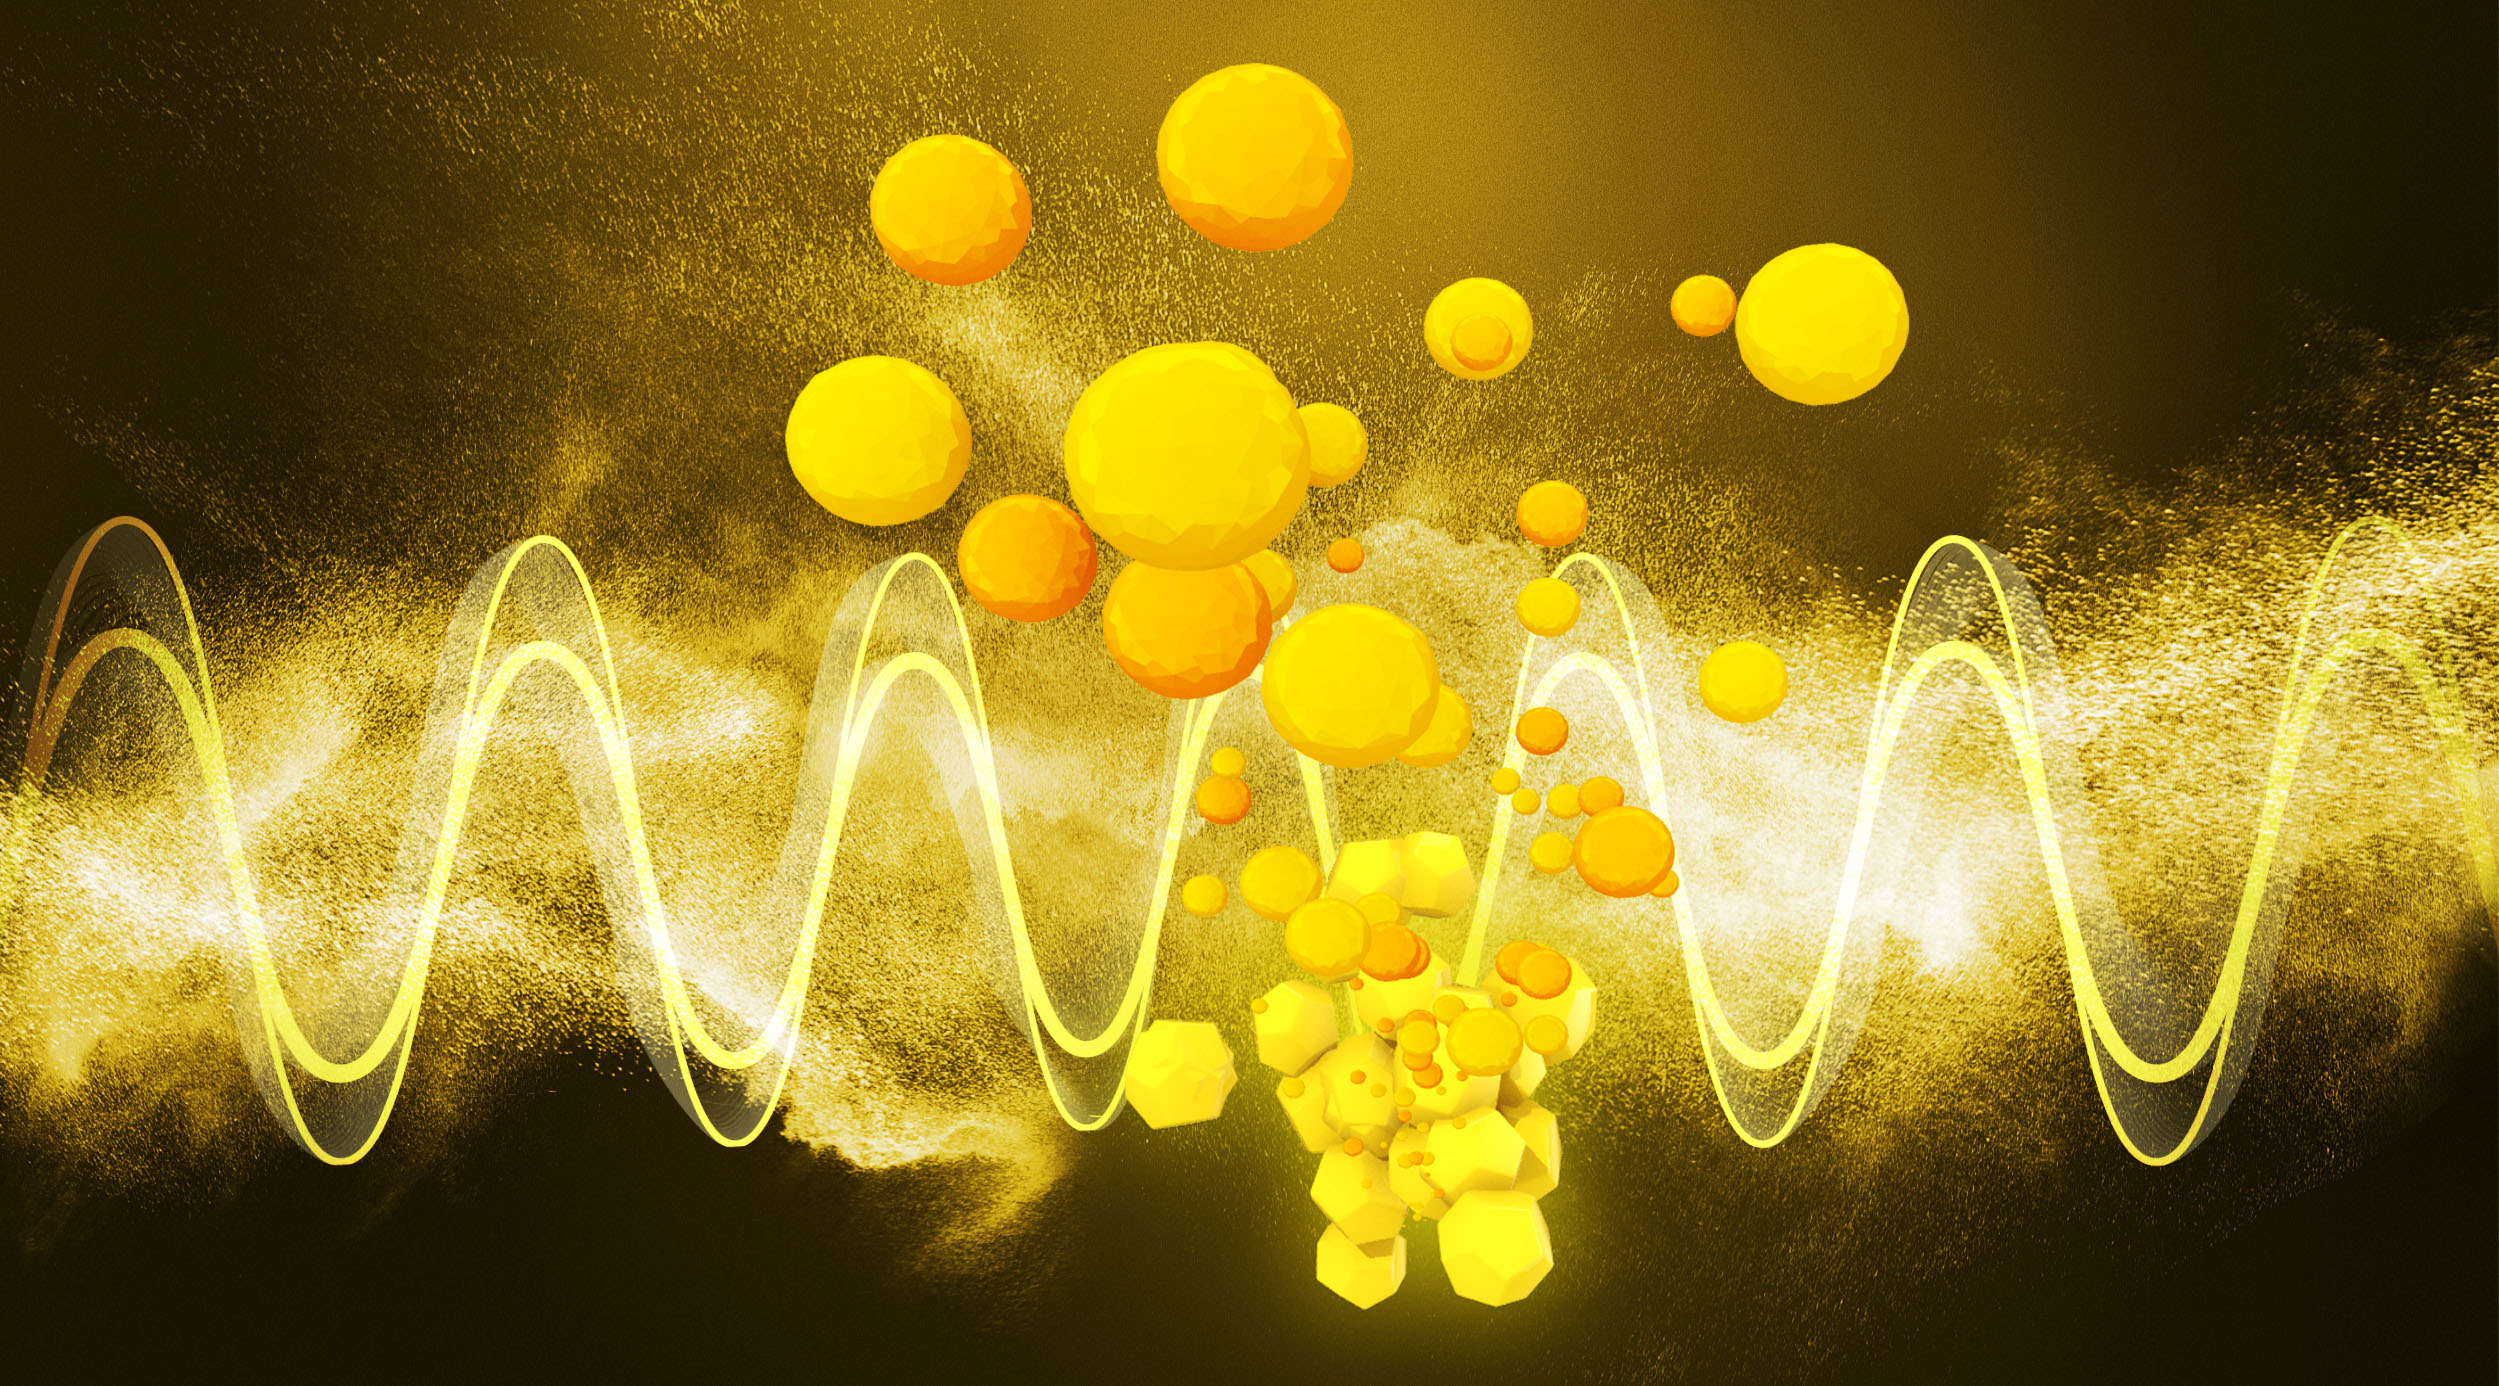 Special-powder-pigments-by-Glatt-powder-synthesis